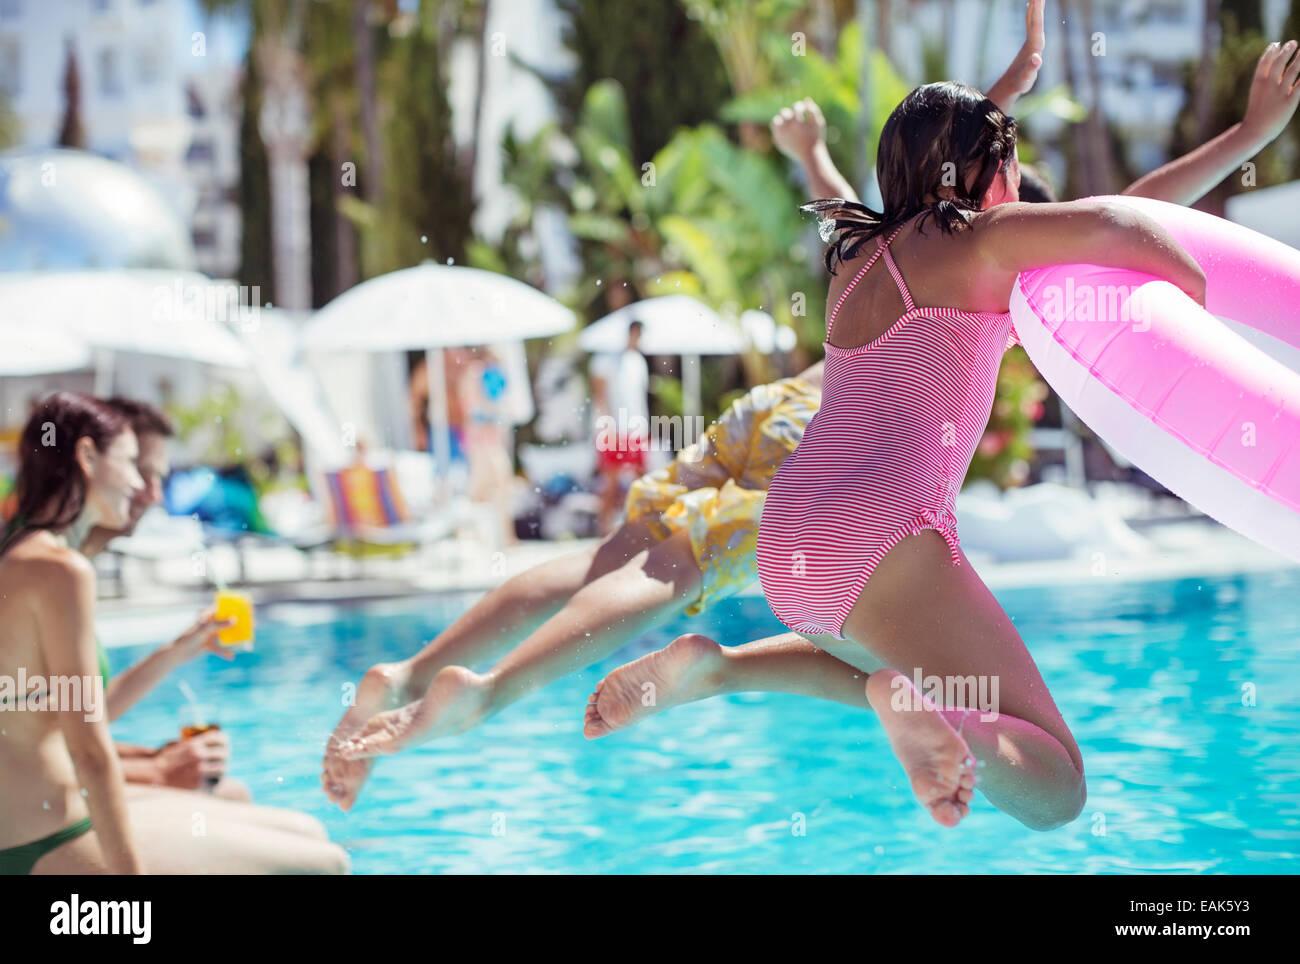 Children jumping into resort swimming pool - Stock Image